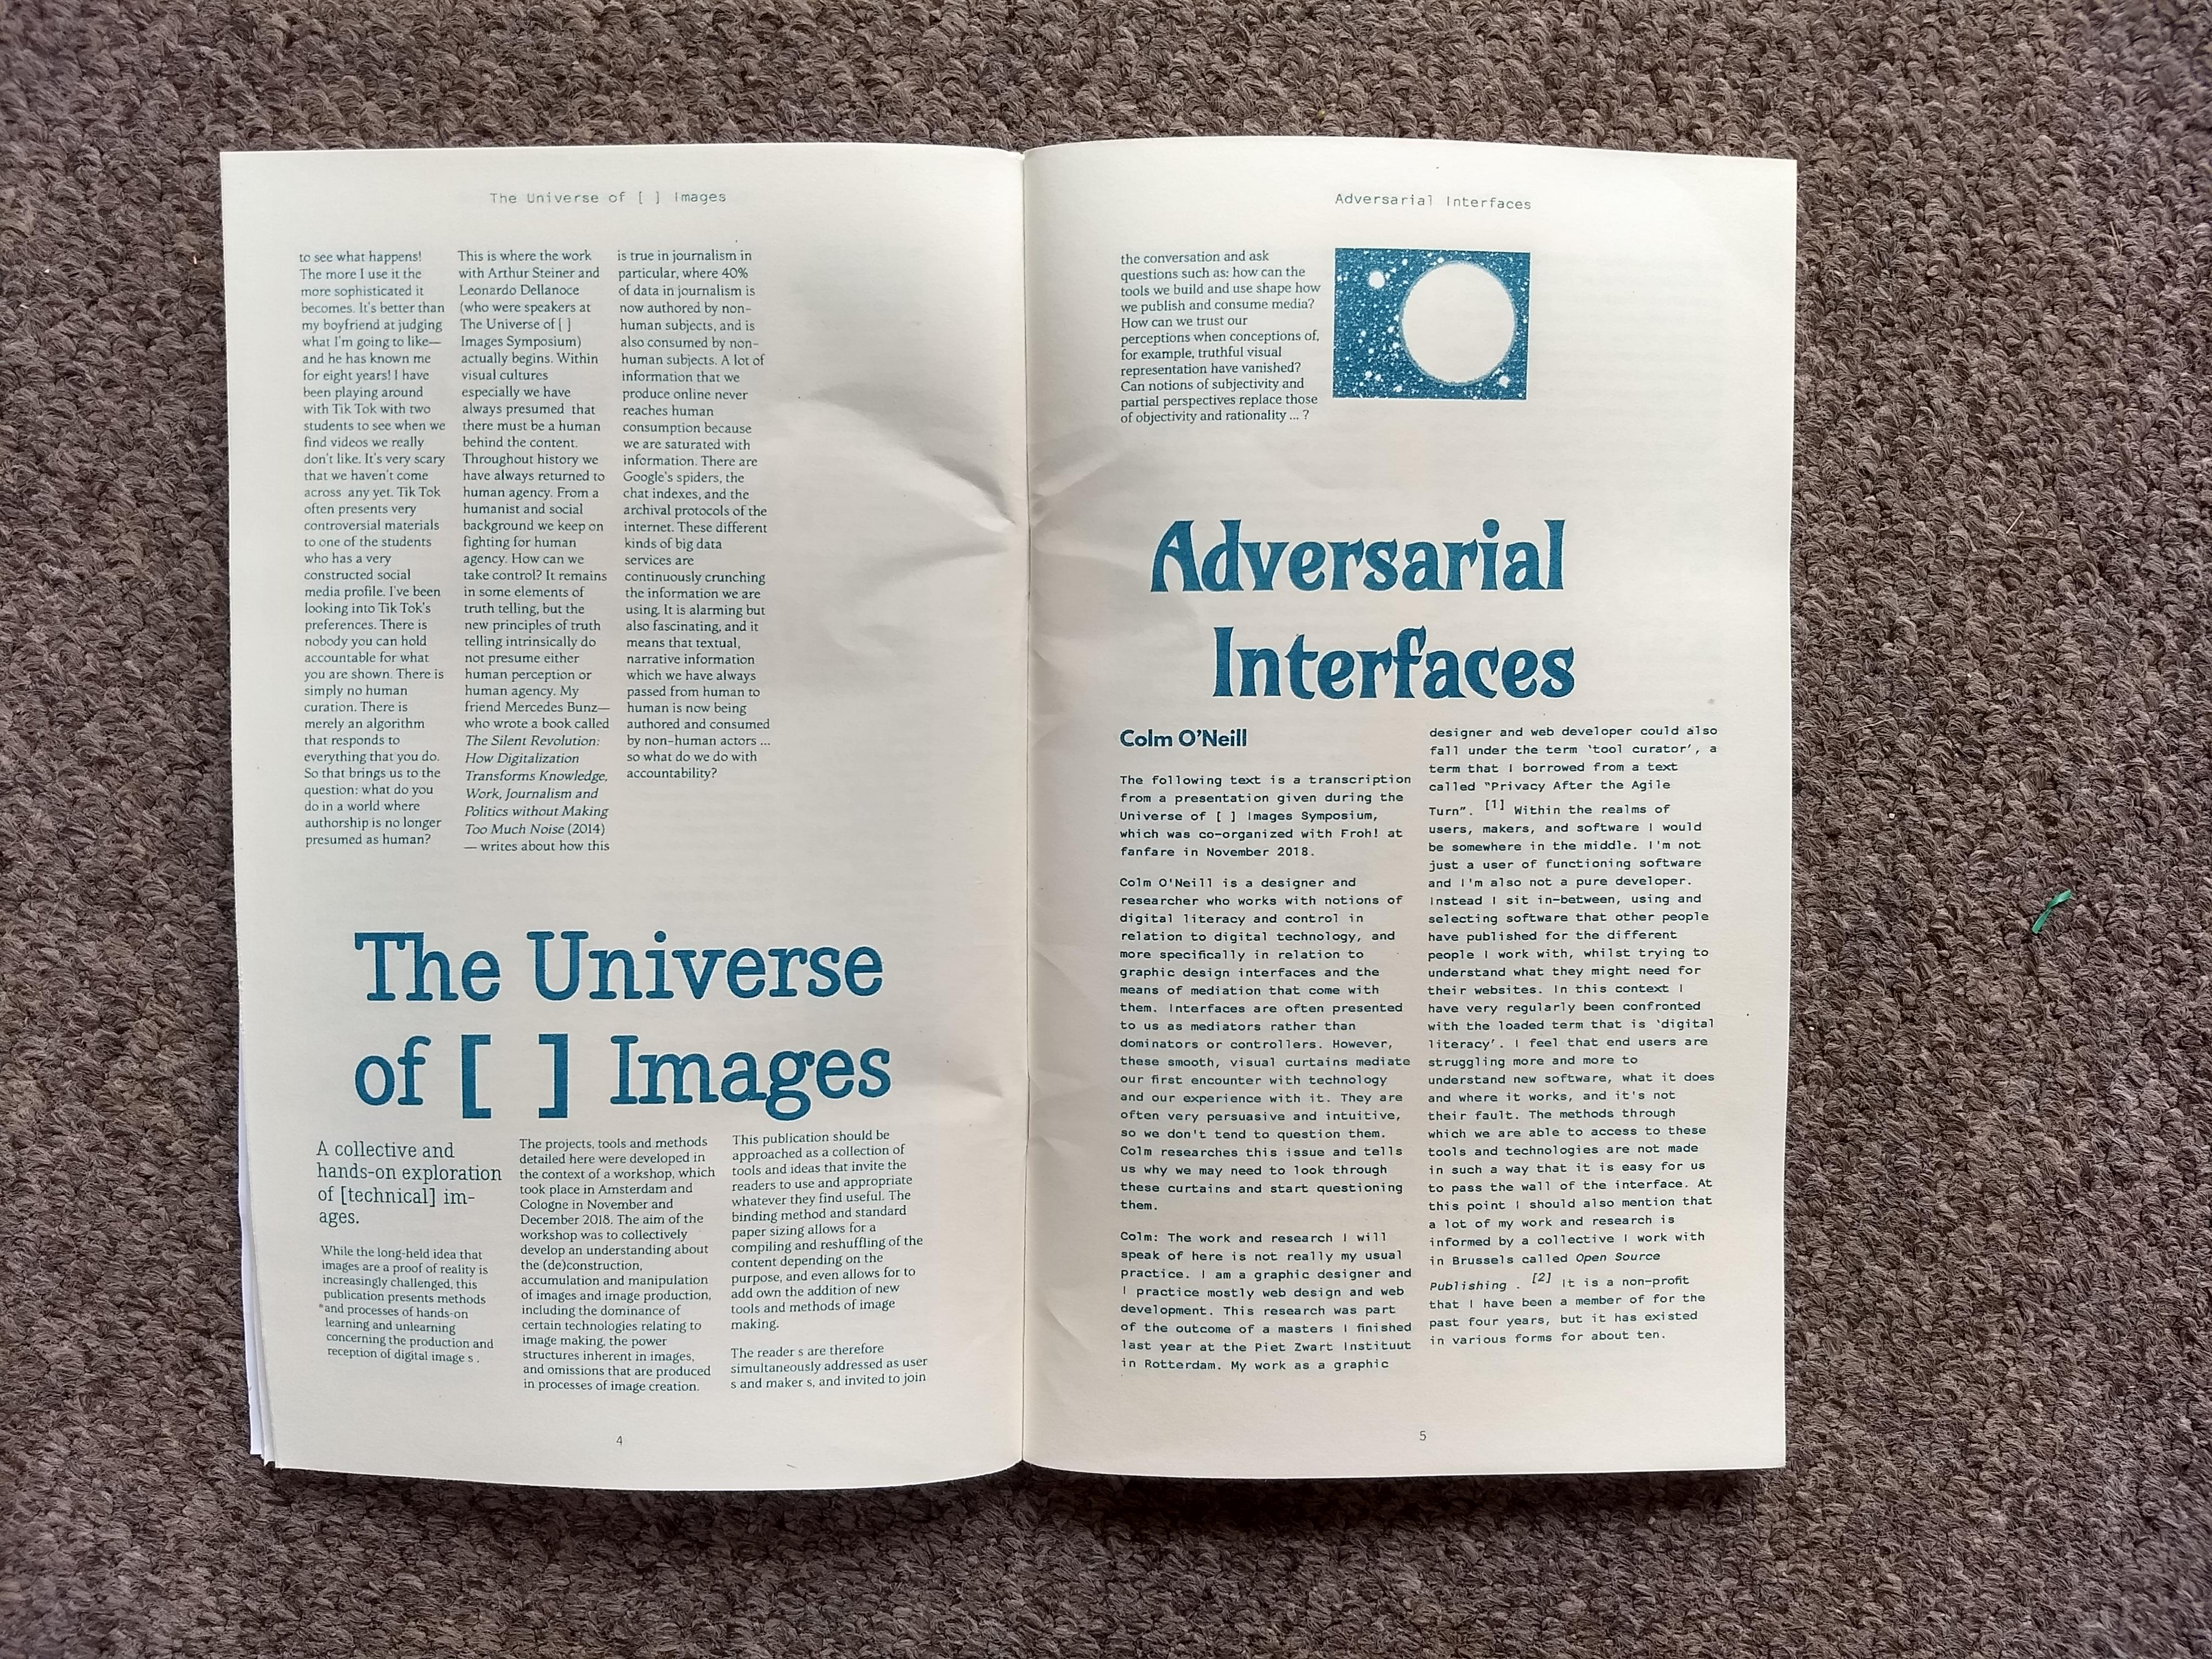 FlaskApp/static/images/samples-of-work/publications/hnd-fake-it5.jpg